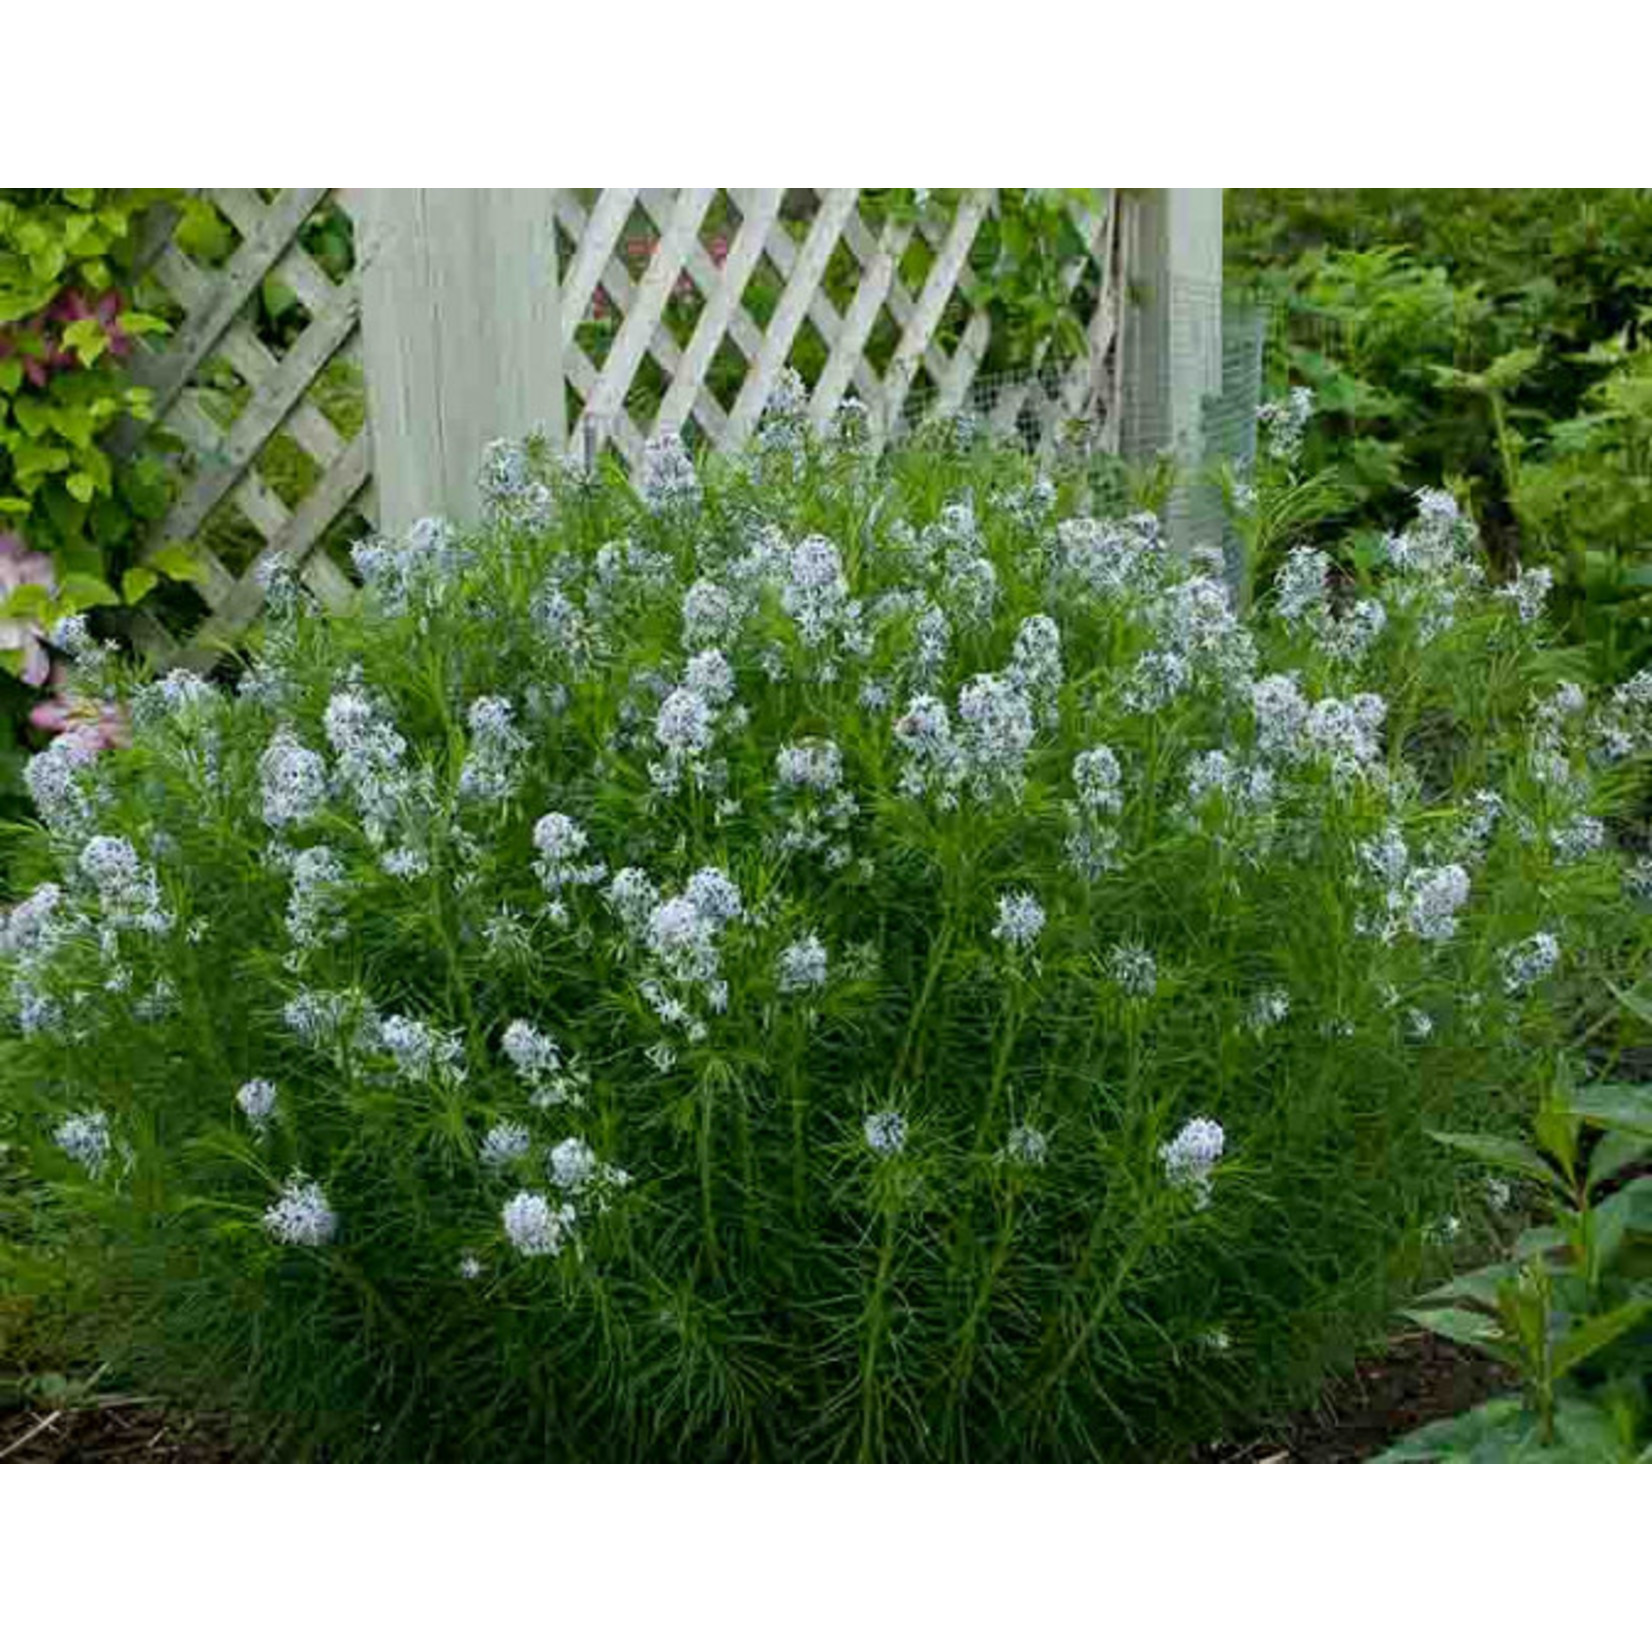 Bluestar 'amsonia hubrichtii' - 2 gal